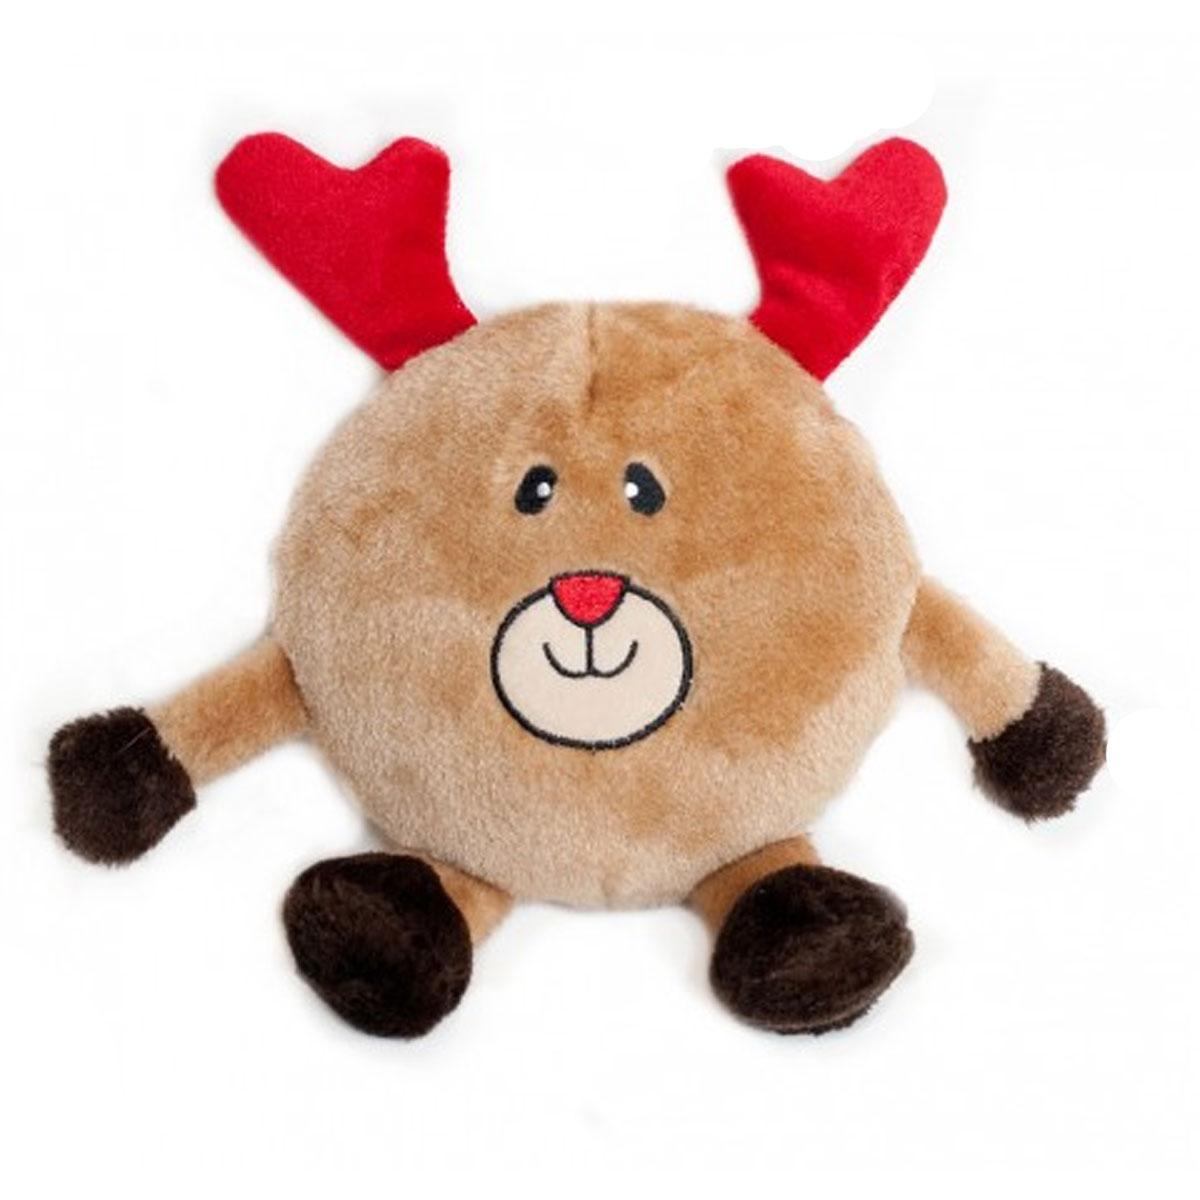 Holiday Brainey Dog Toy - Reindeer